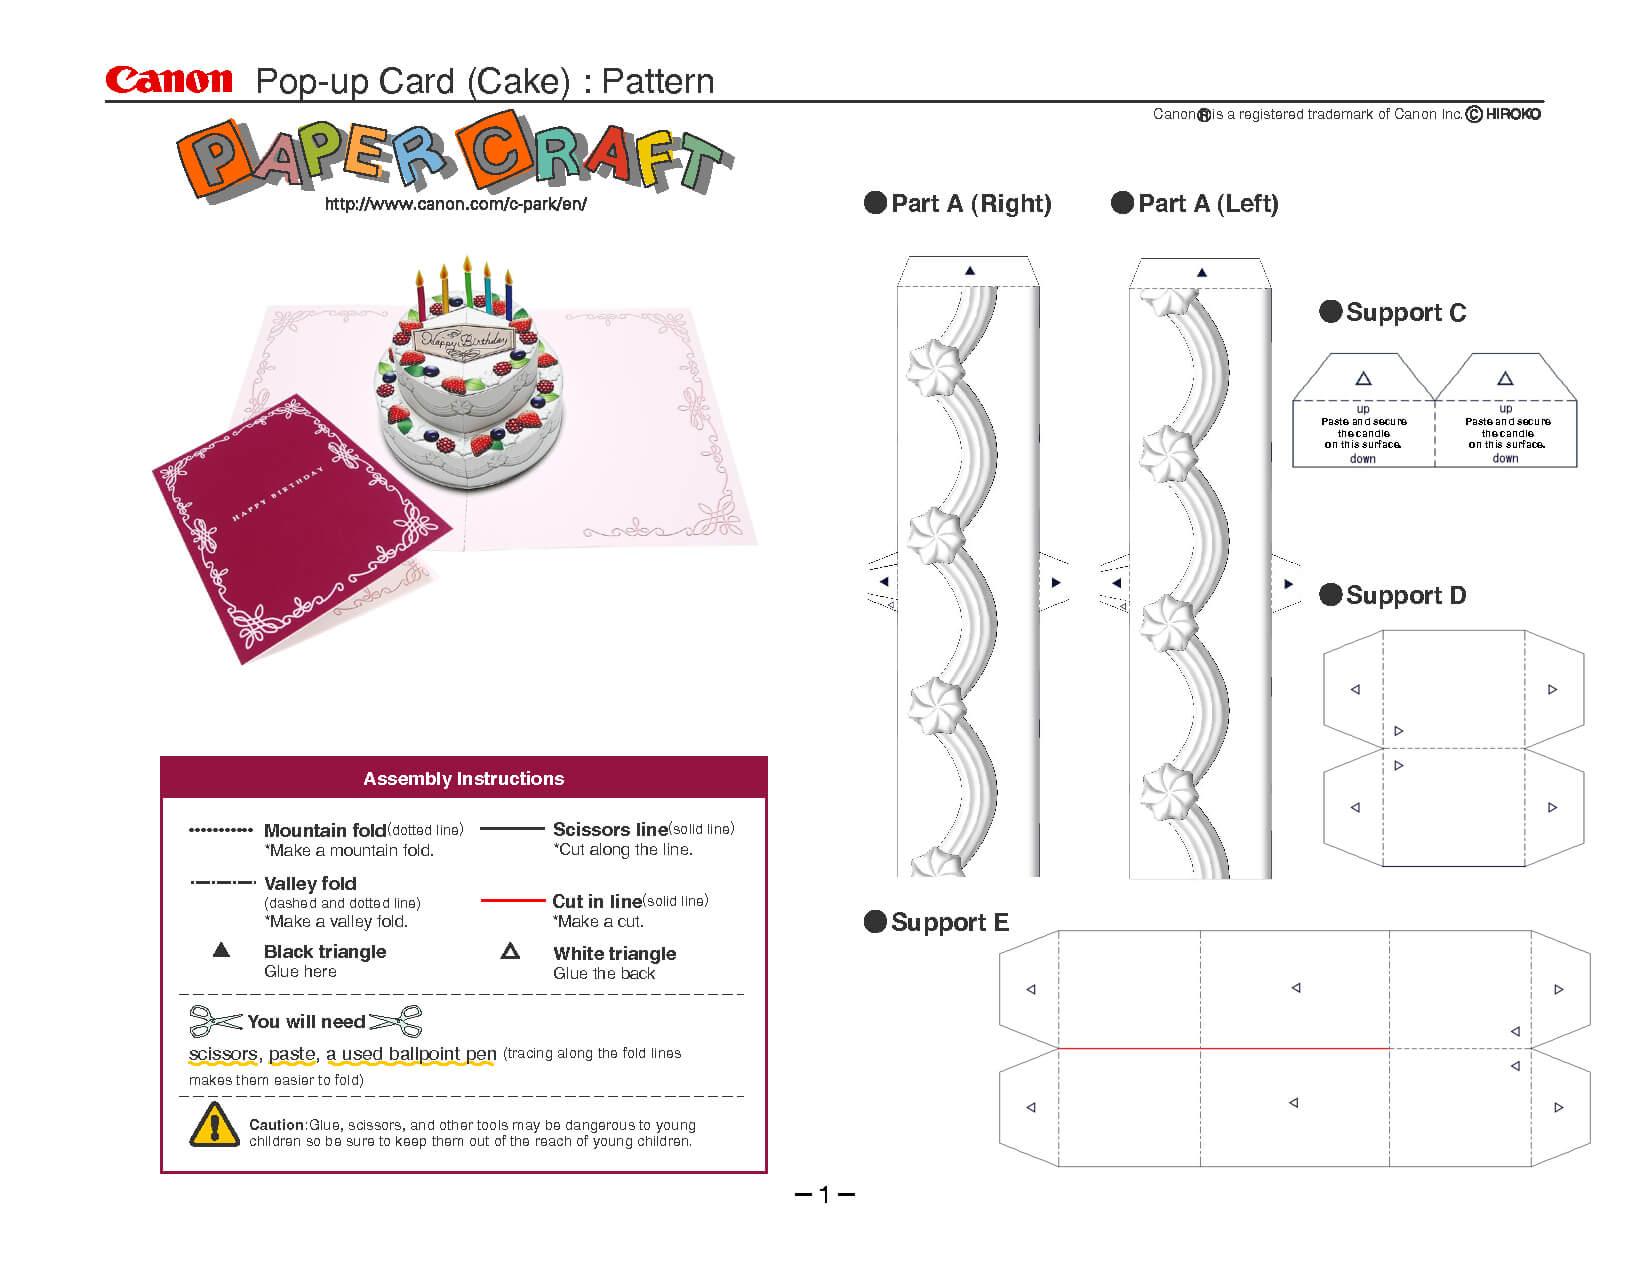 Birthday Cake Pop Up Card Template | Pop Up Card Templates Pertaining To Printable Pop Up Card Templates Free